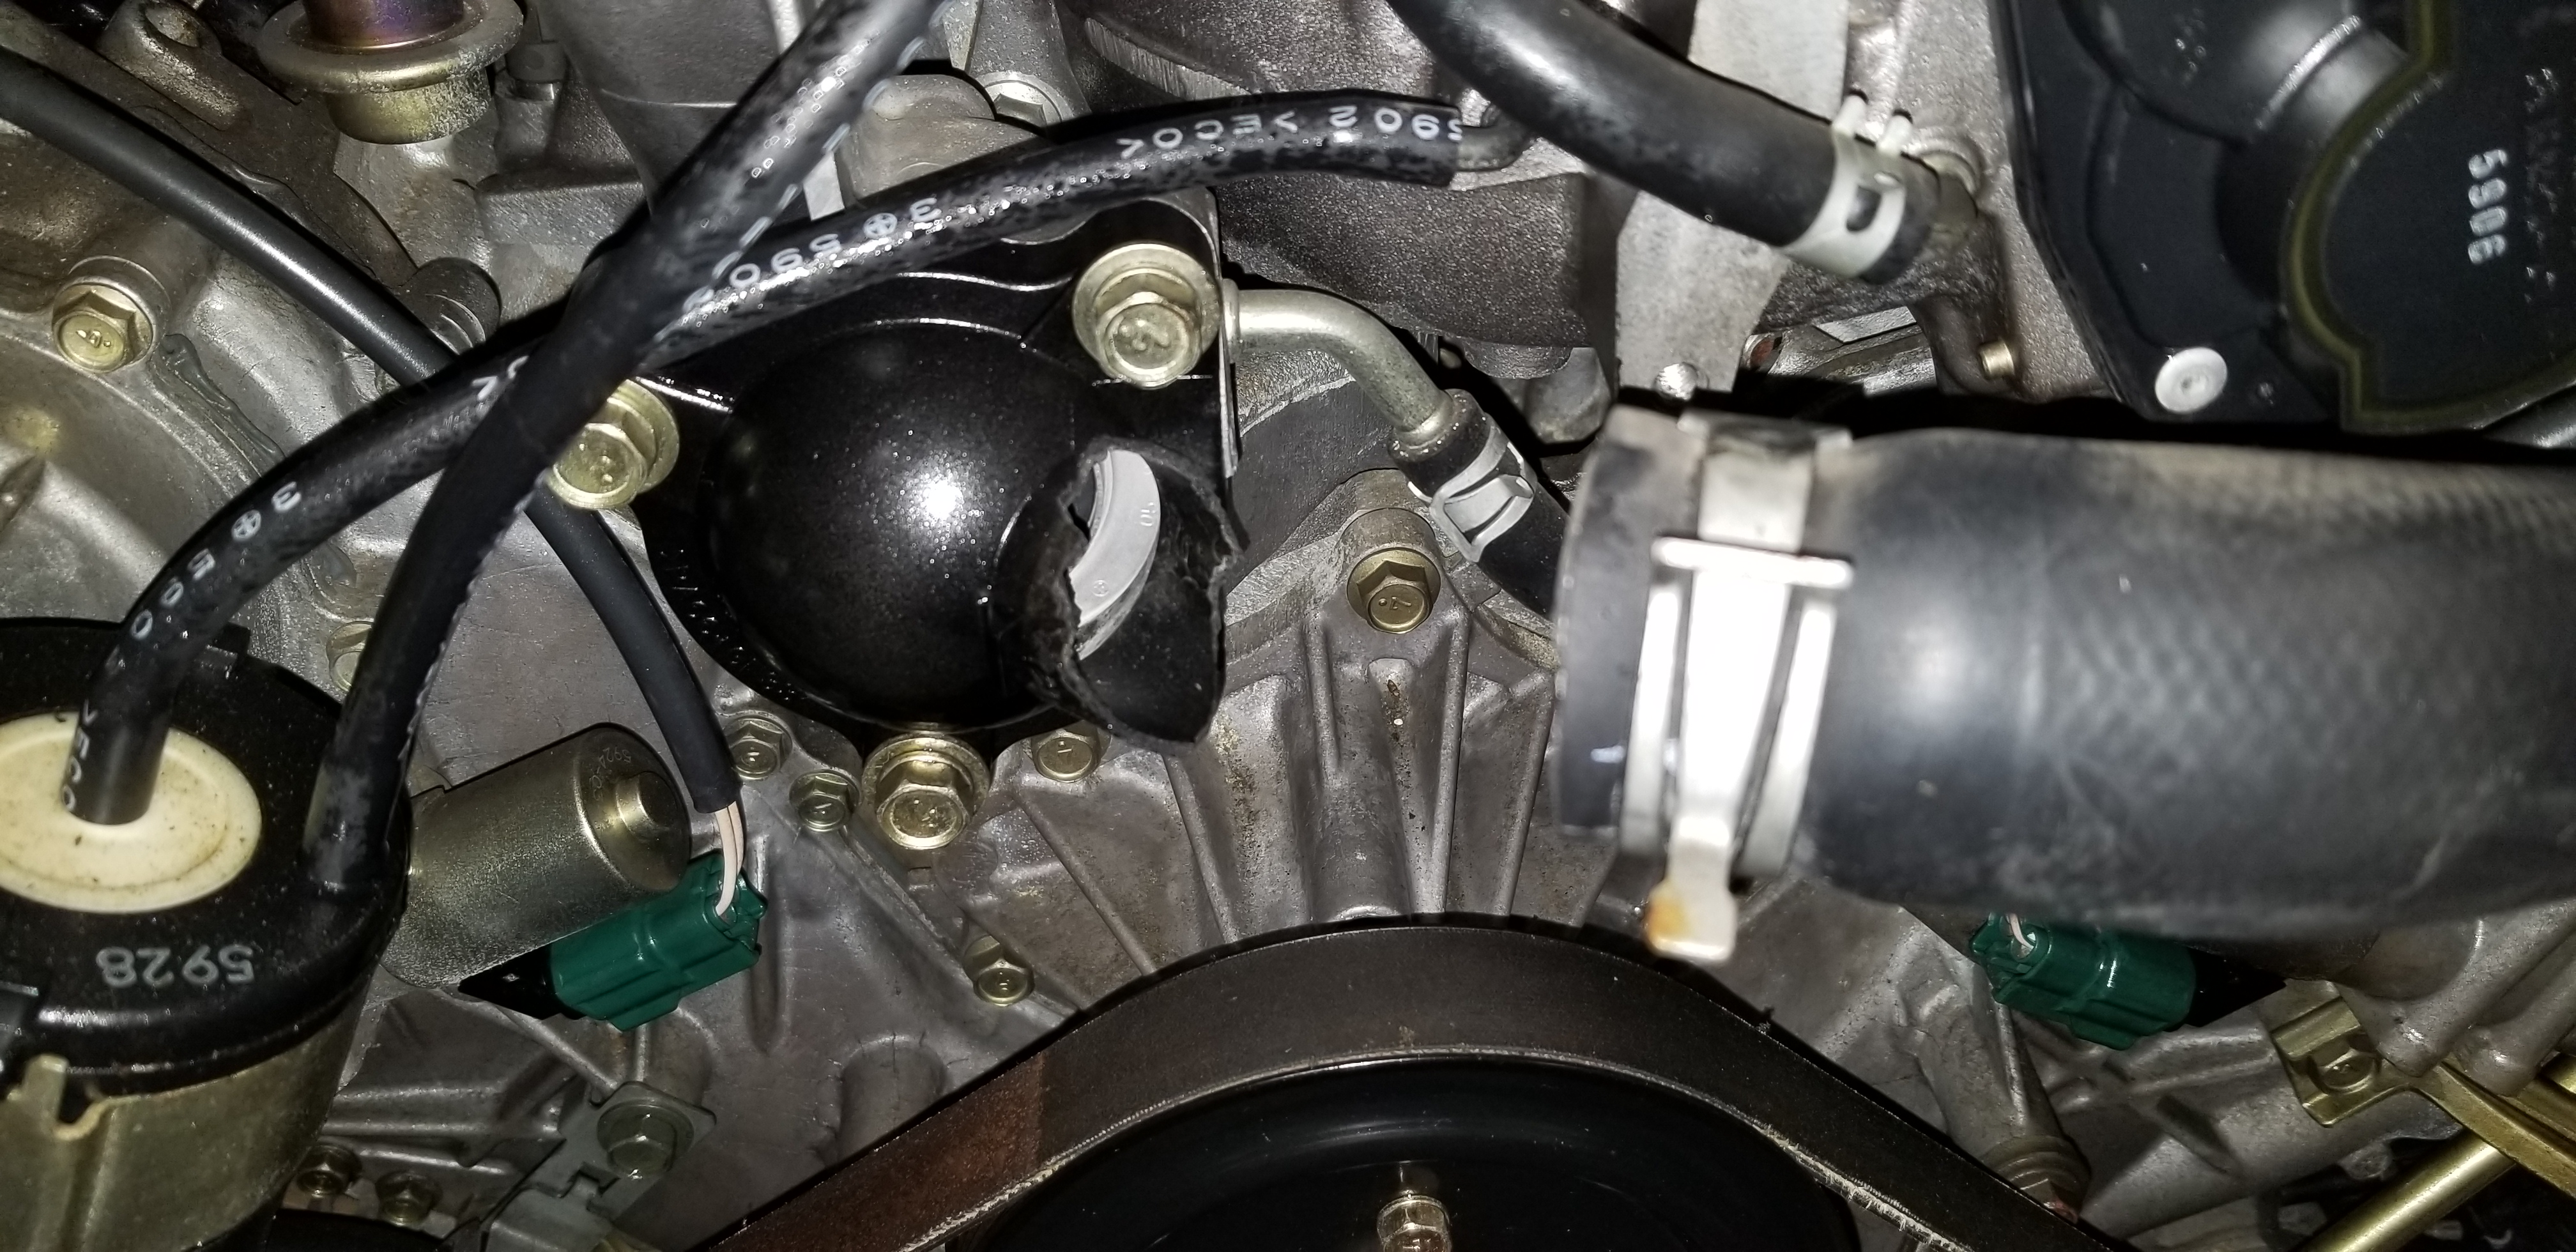 VK45DE INFINITY RWD Q45 M45 FX45 2002 2010 JDM COMPLETE ENGINE TRANSMISSION SWAP | JDM Of San Diego